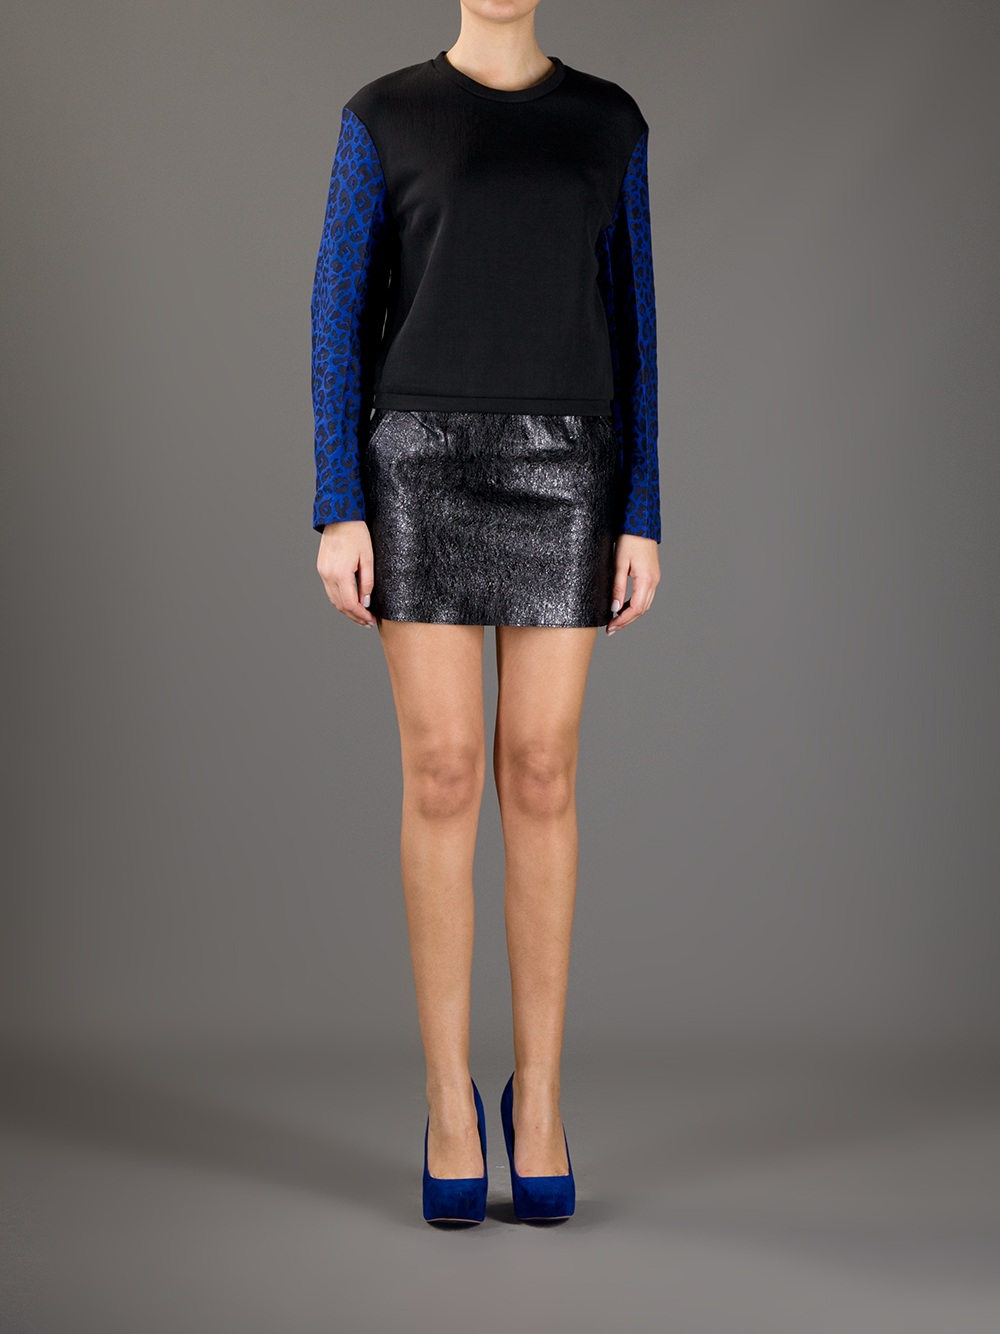 3 1 phillip lim metallic leather skirt in black lyst